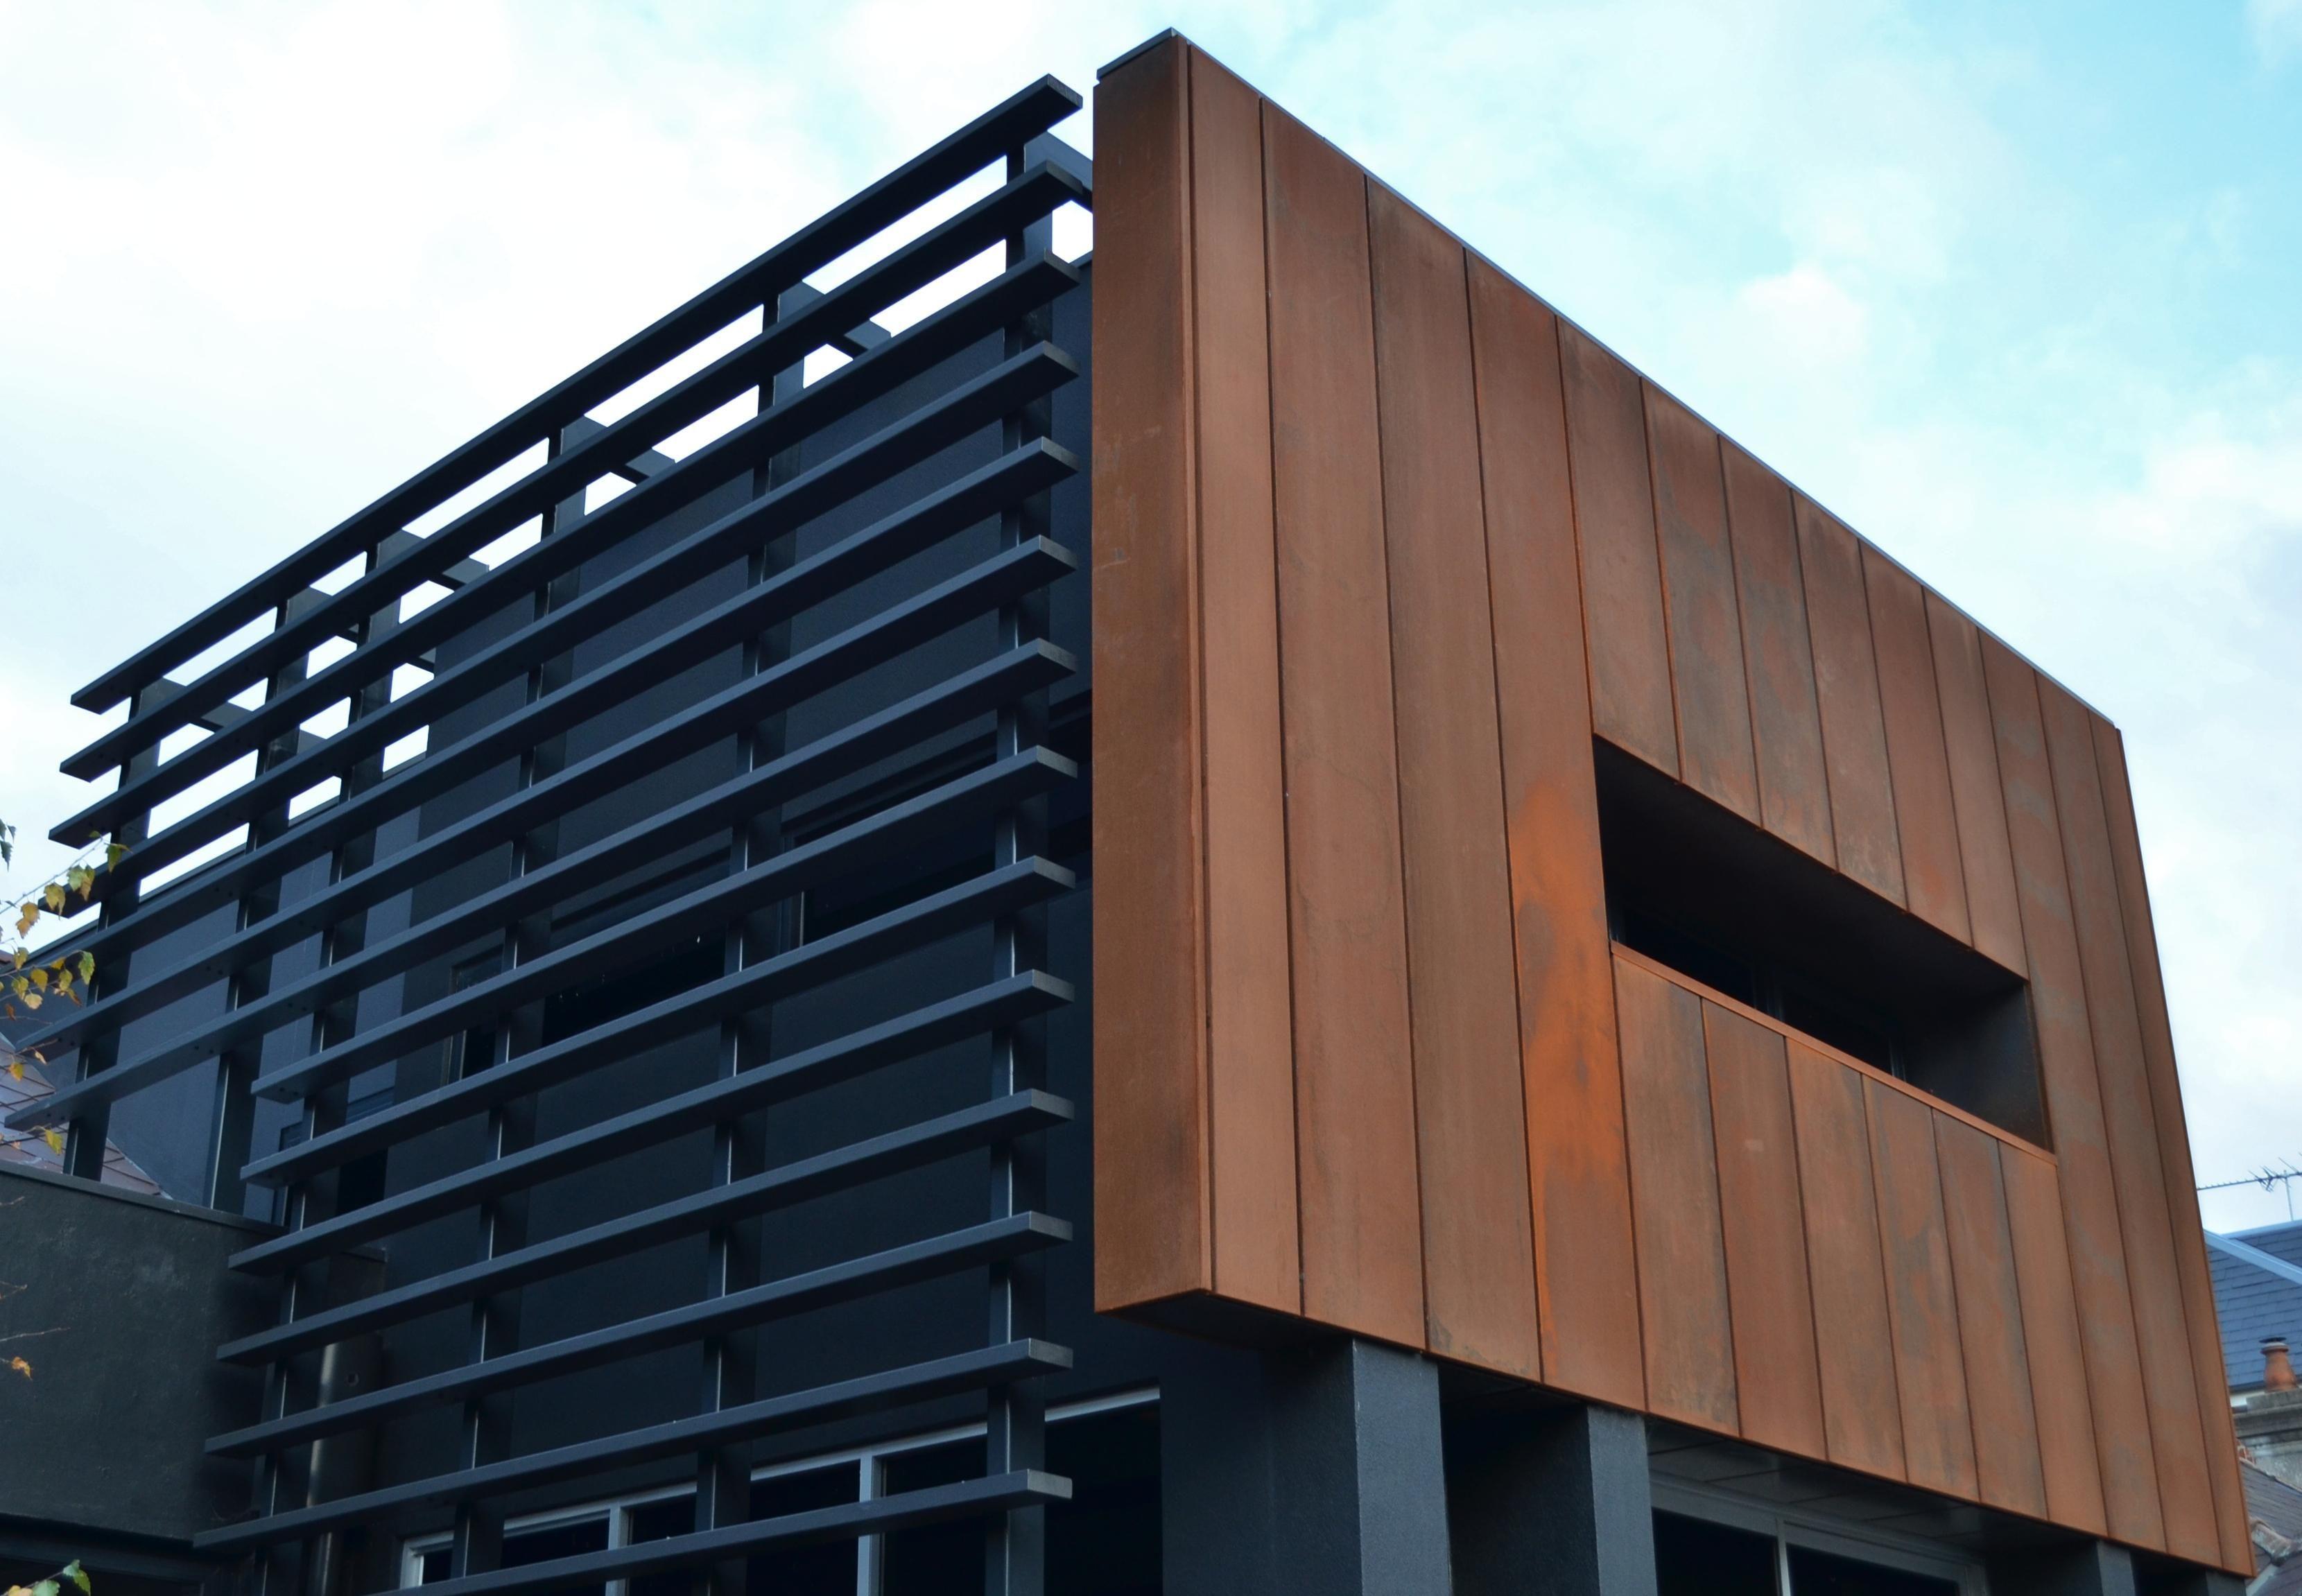 Cassette Panel (Corten®) | Design Cladding | Architecture ...